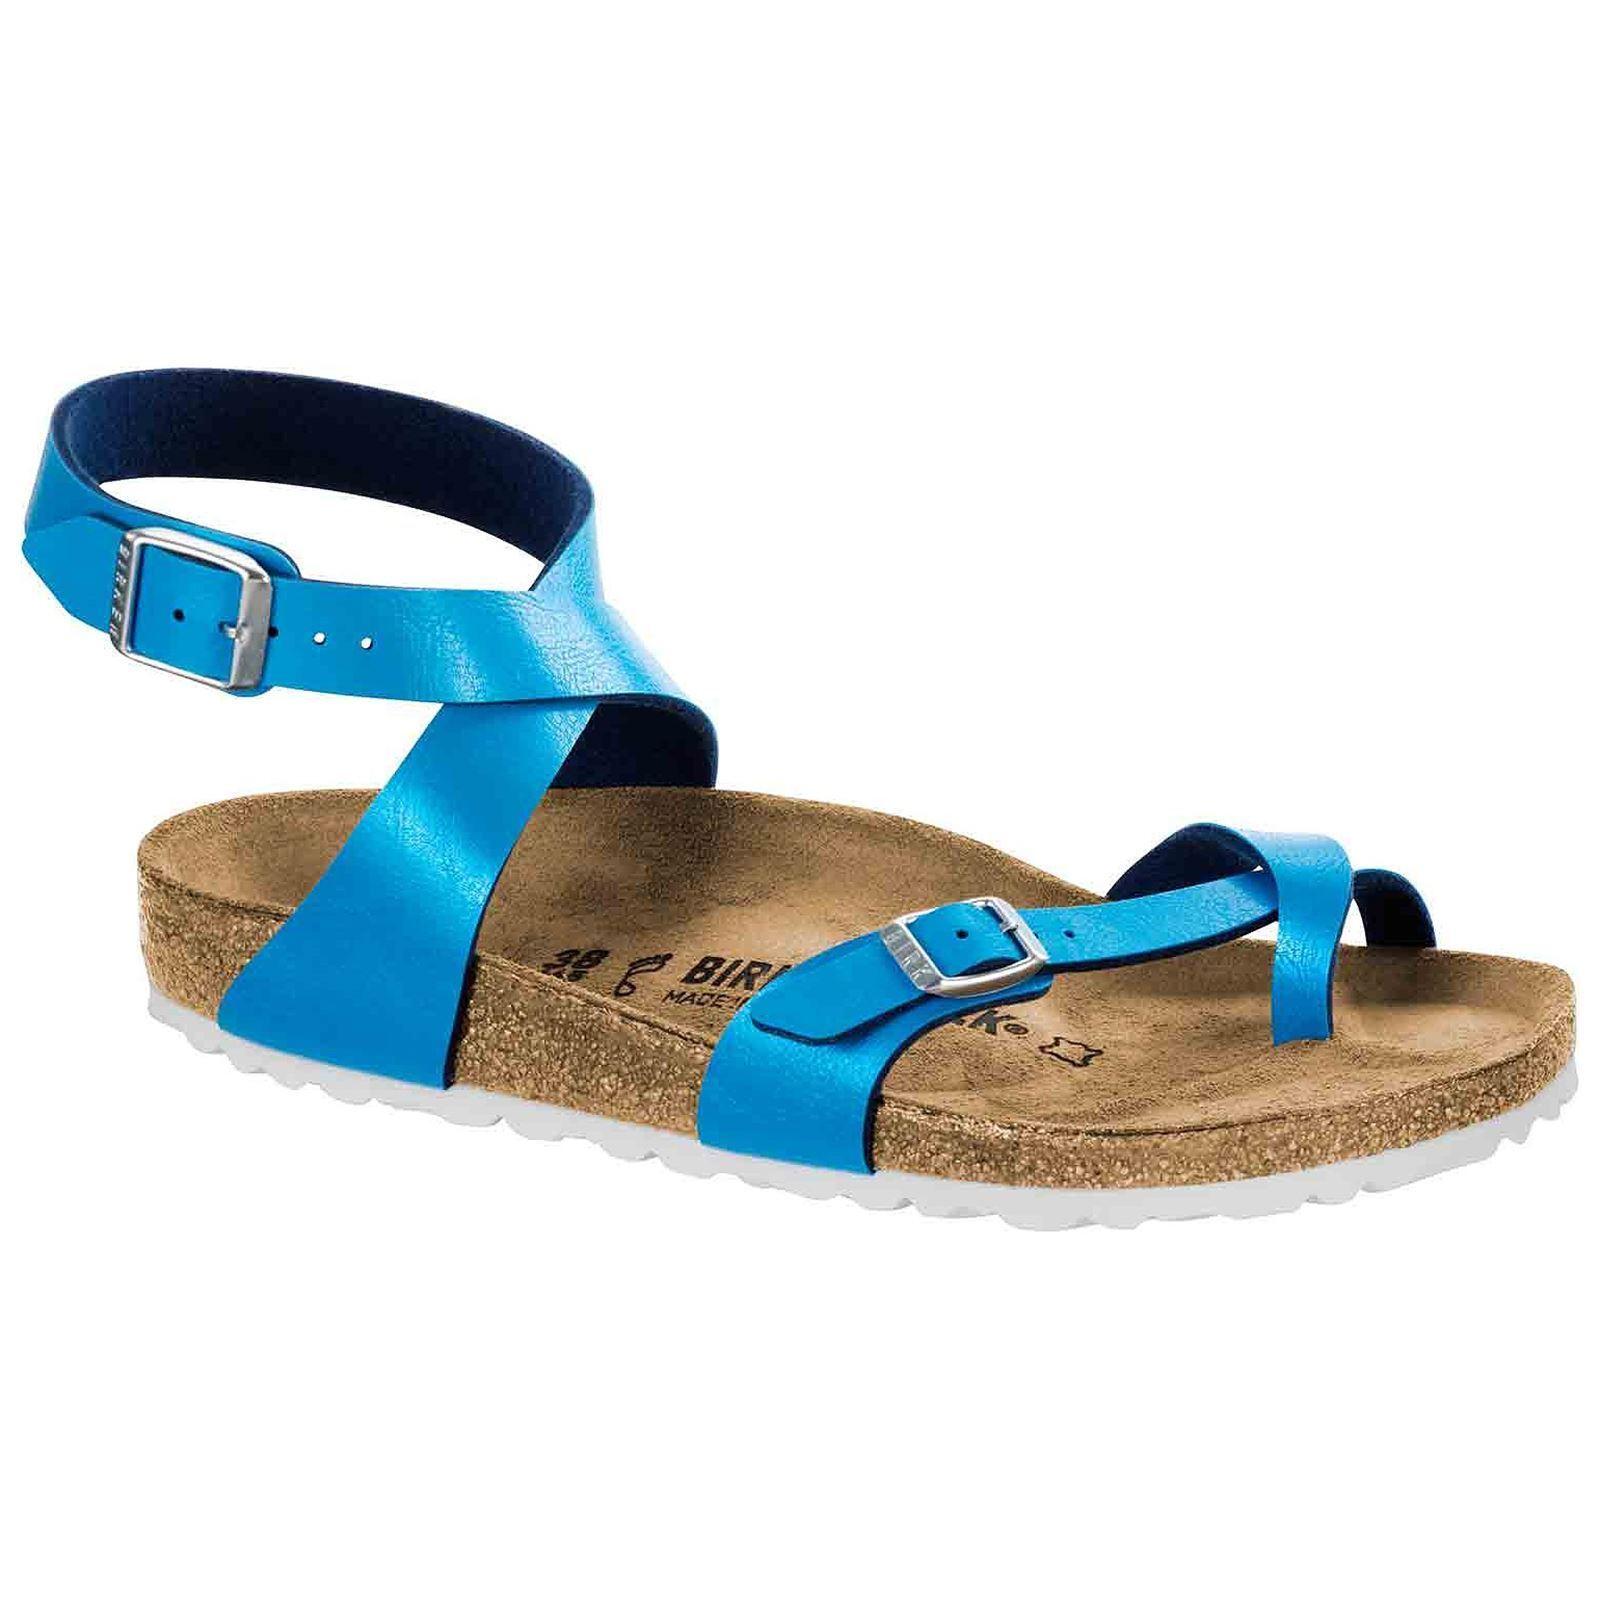 Último gran descuento Birkenstock Yara Graceful Ocean Womens Birko-Flor Ankle Strap Toe-post Sandals